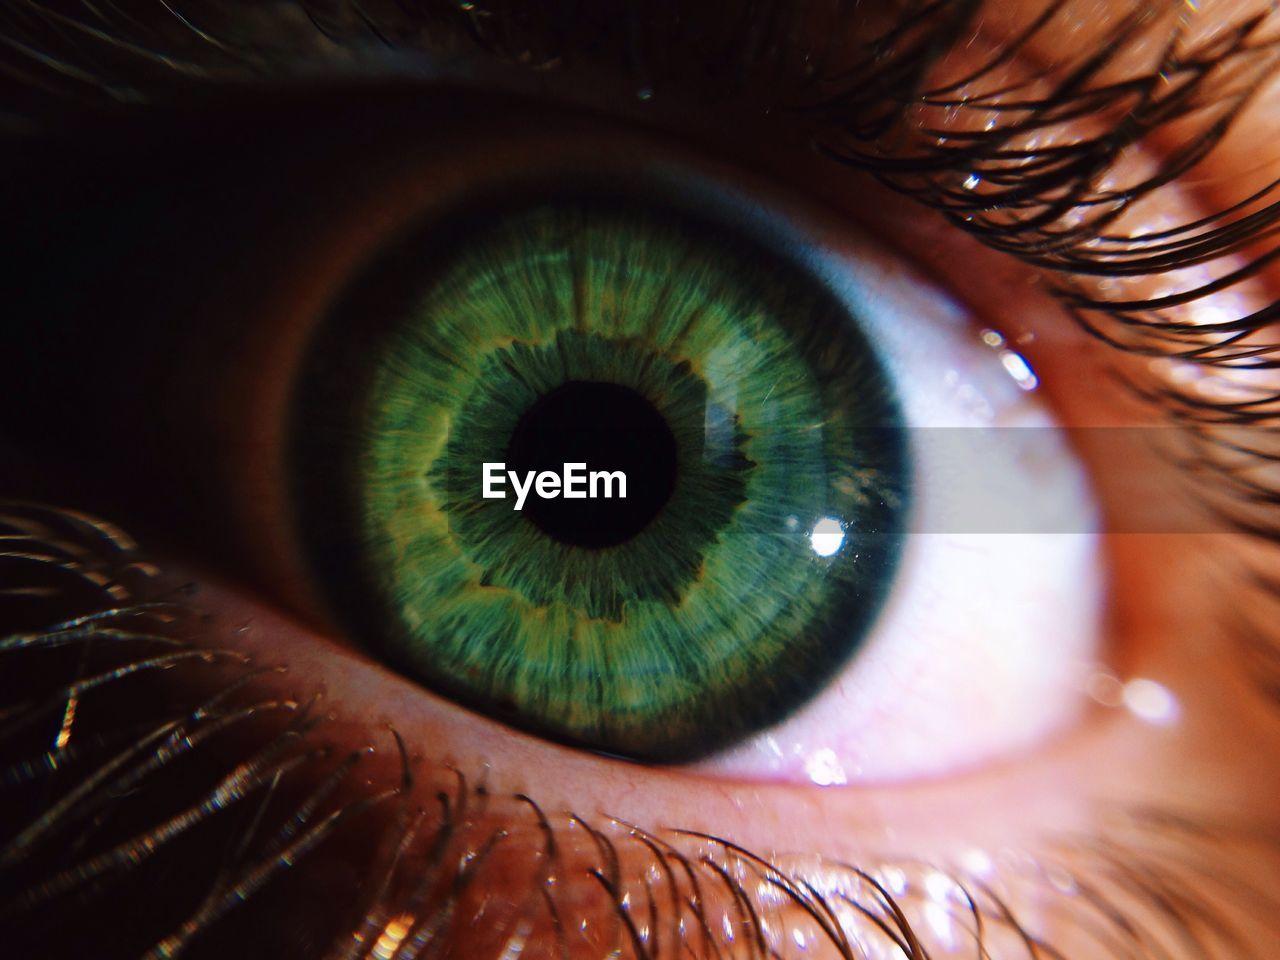 human eye, eyelash, eyesight, real people, one person, sensory perception, eyeball, human body part, close-up, looking at camera, iris - eye, indoors, portrait, day, people